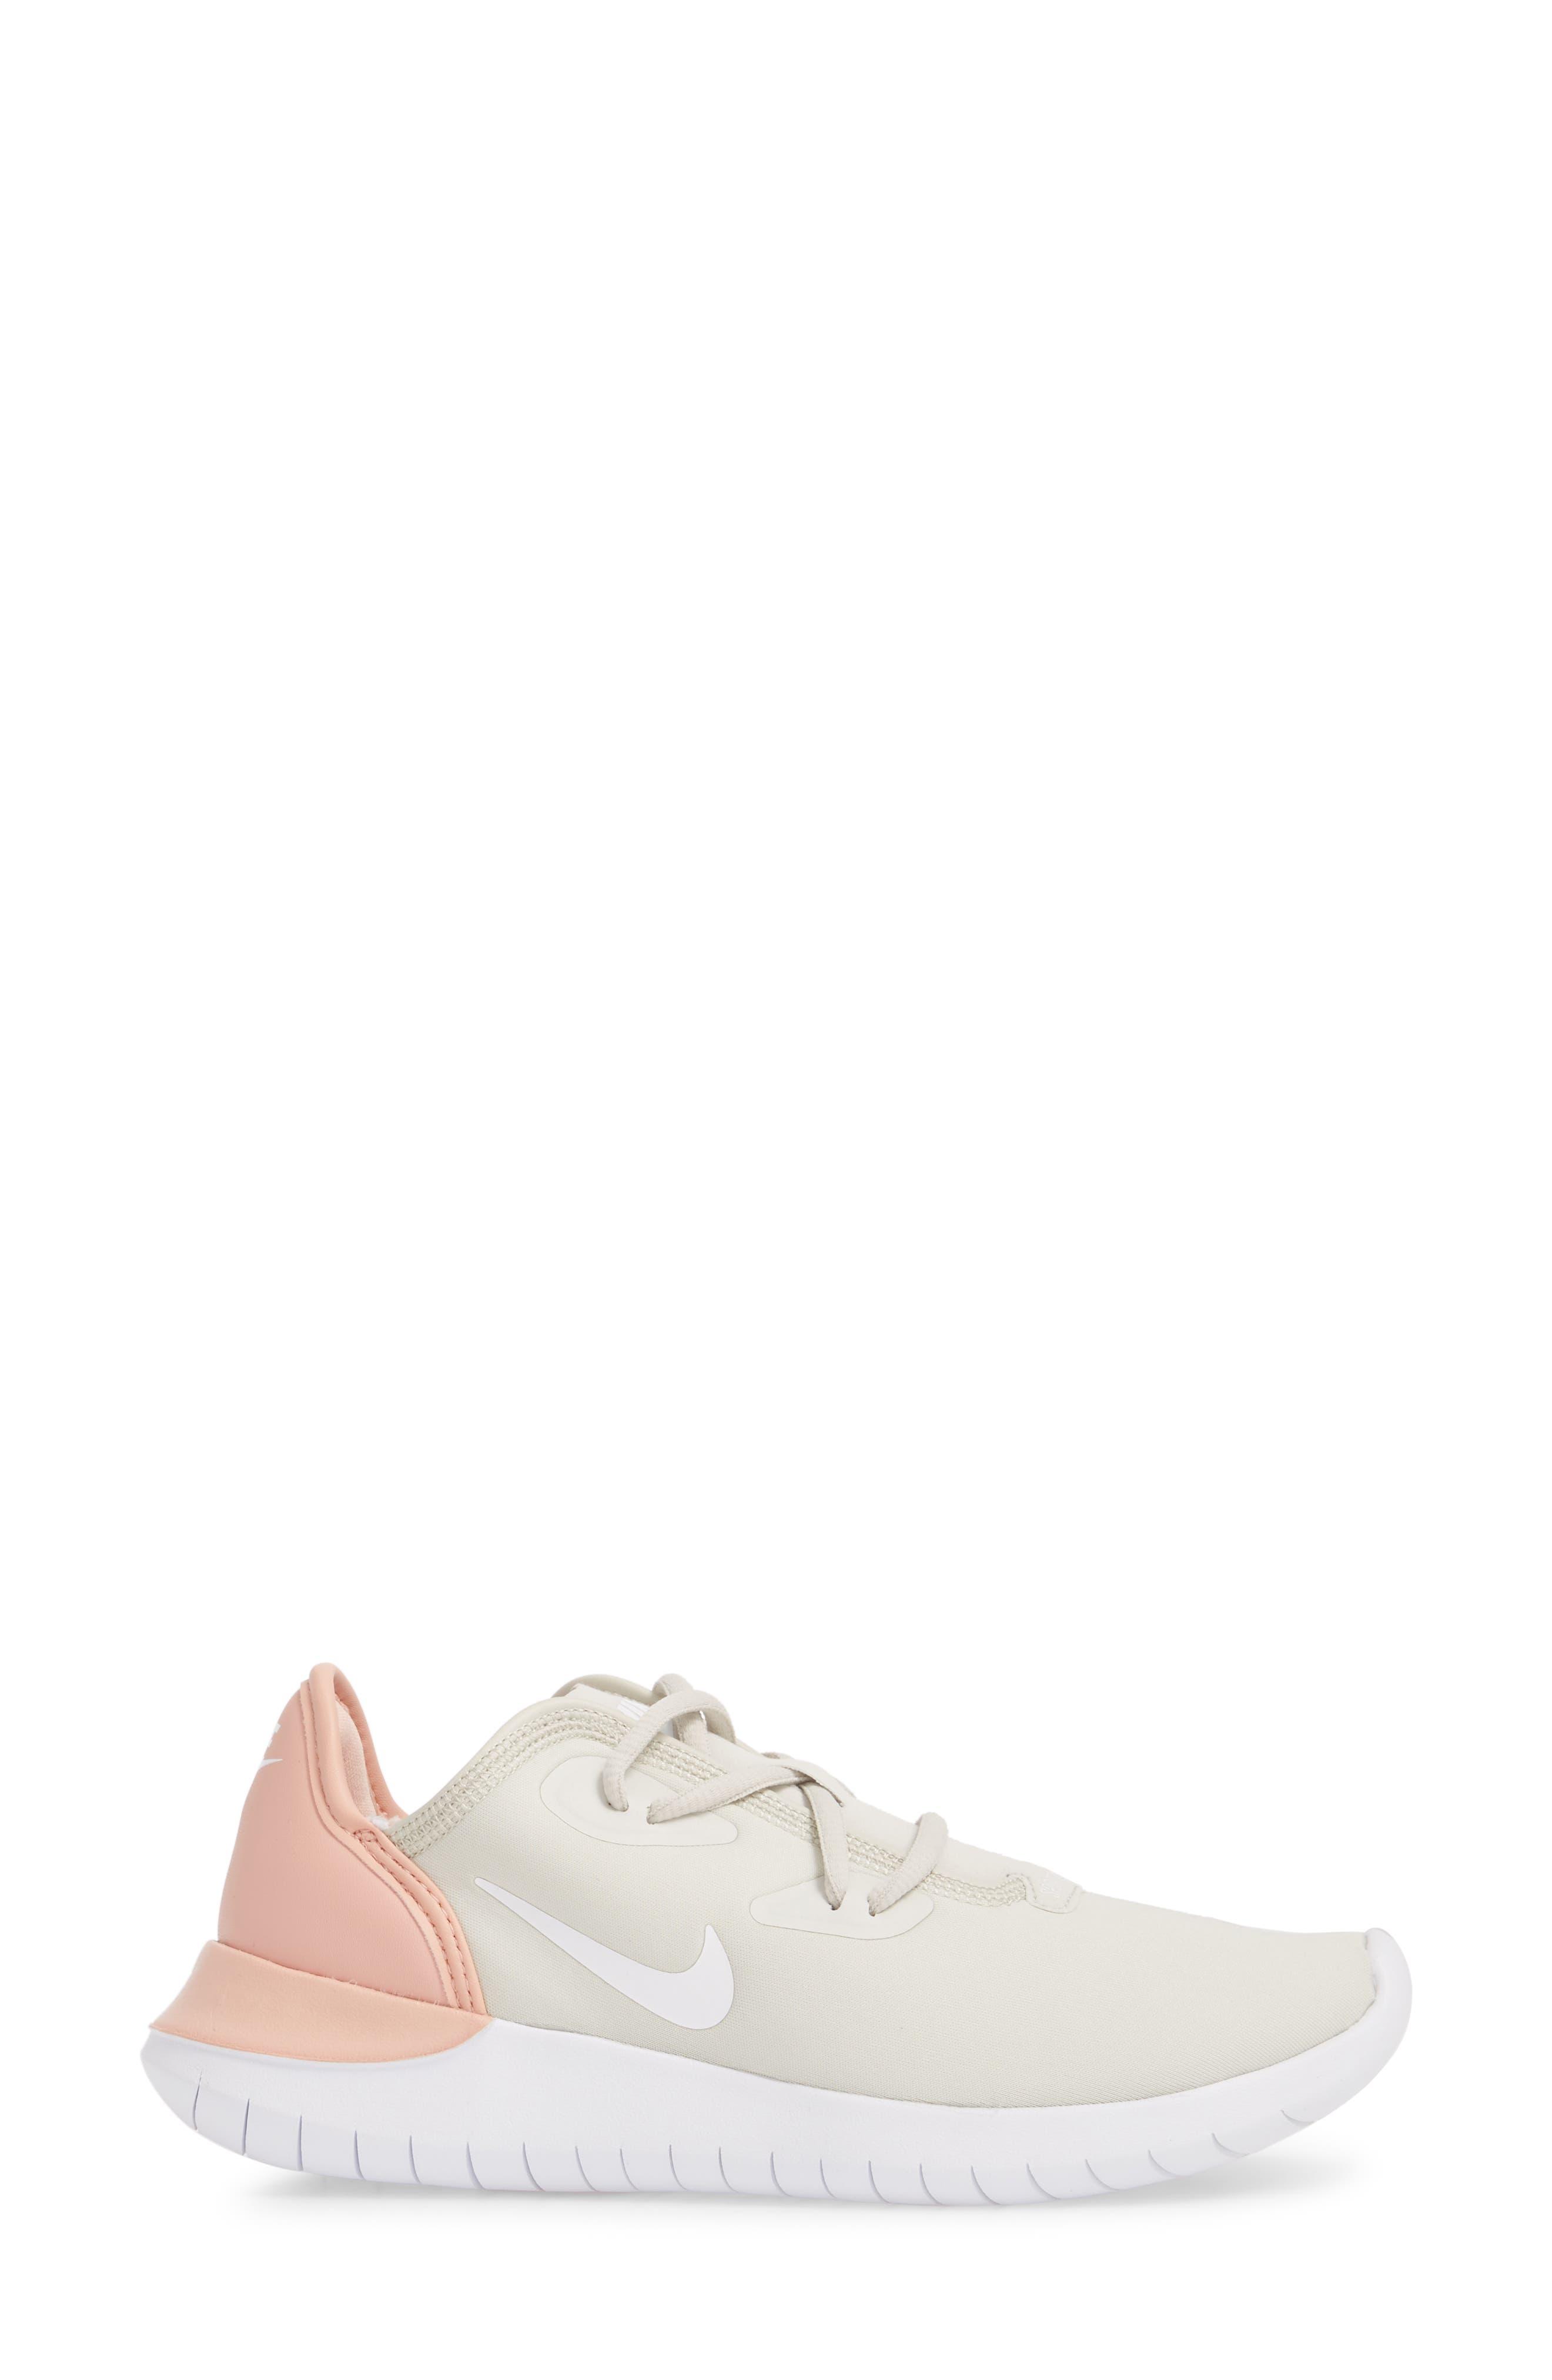 Hakata Sneaker,                             Alternate thumbnail 3, color,                             Light Bone/ White/ Coral